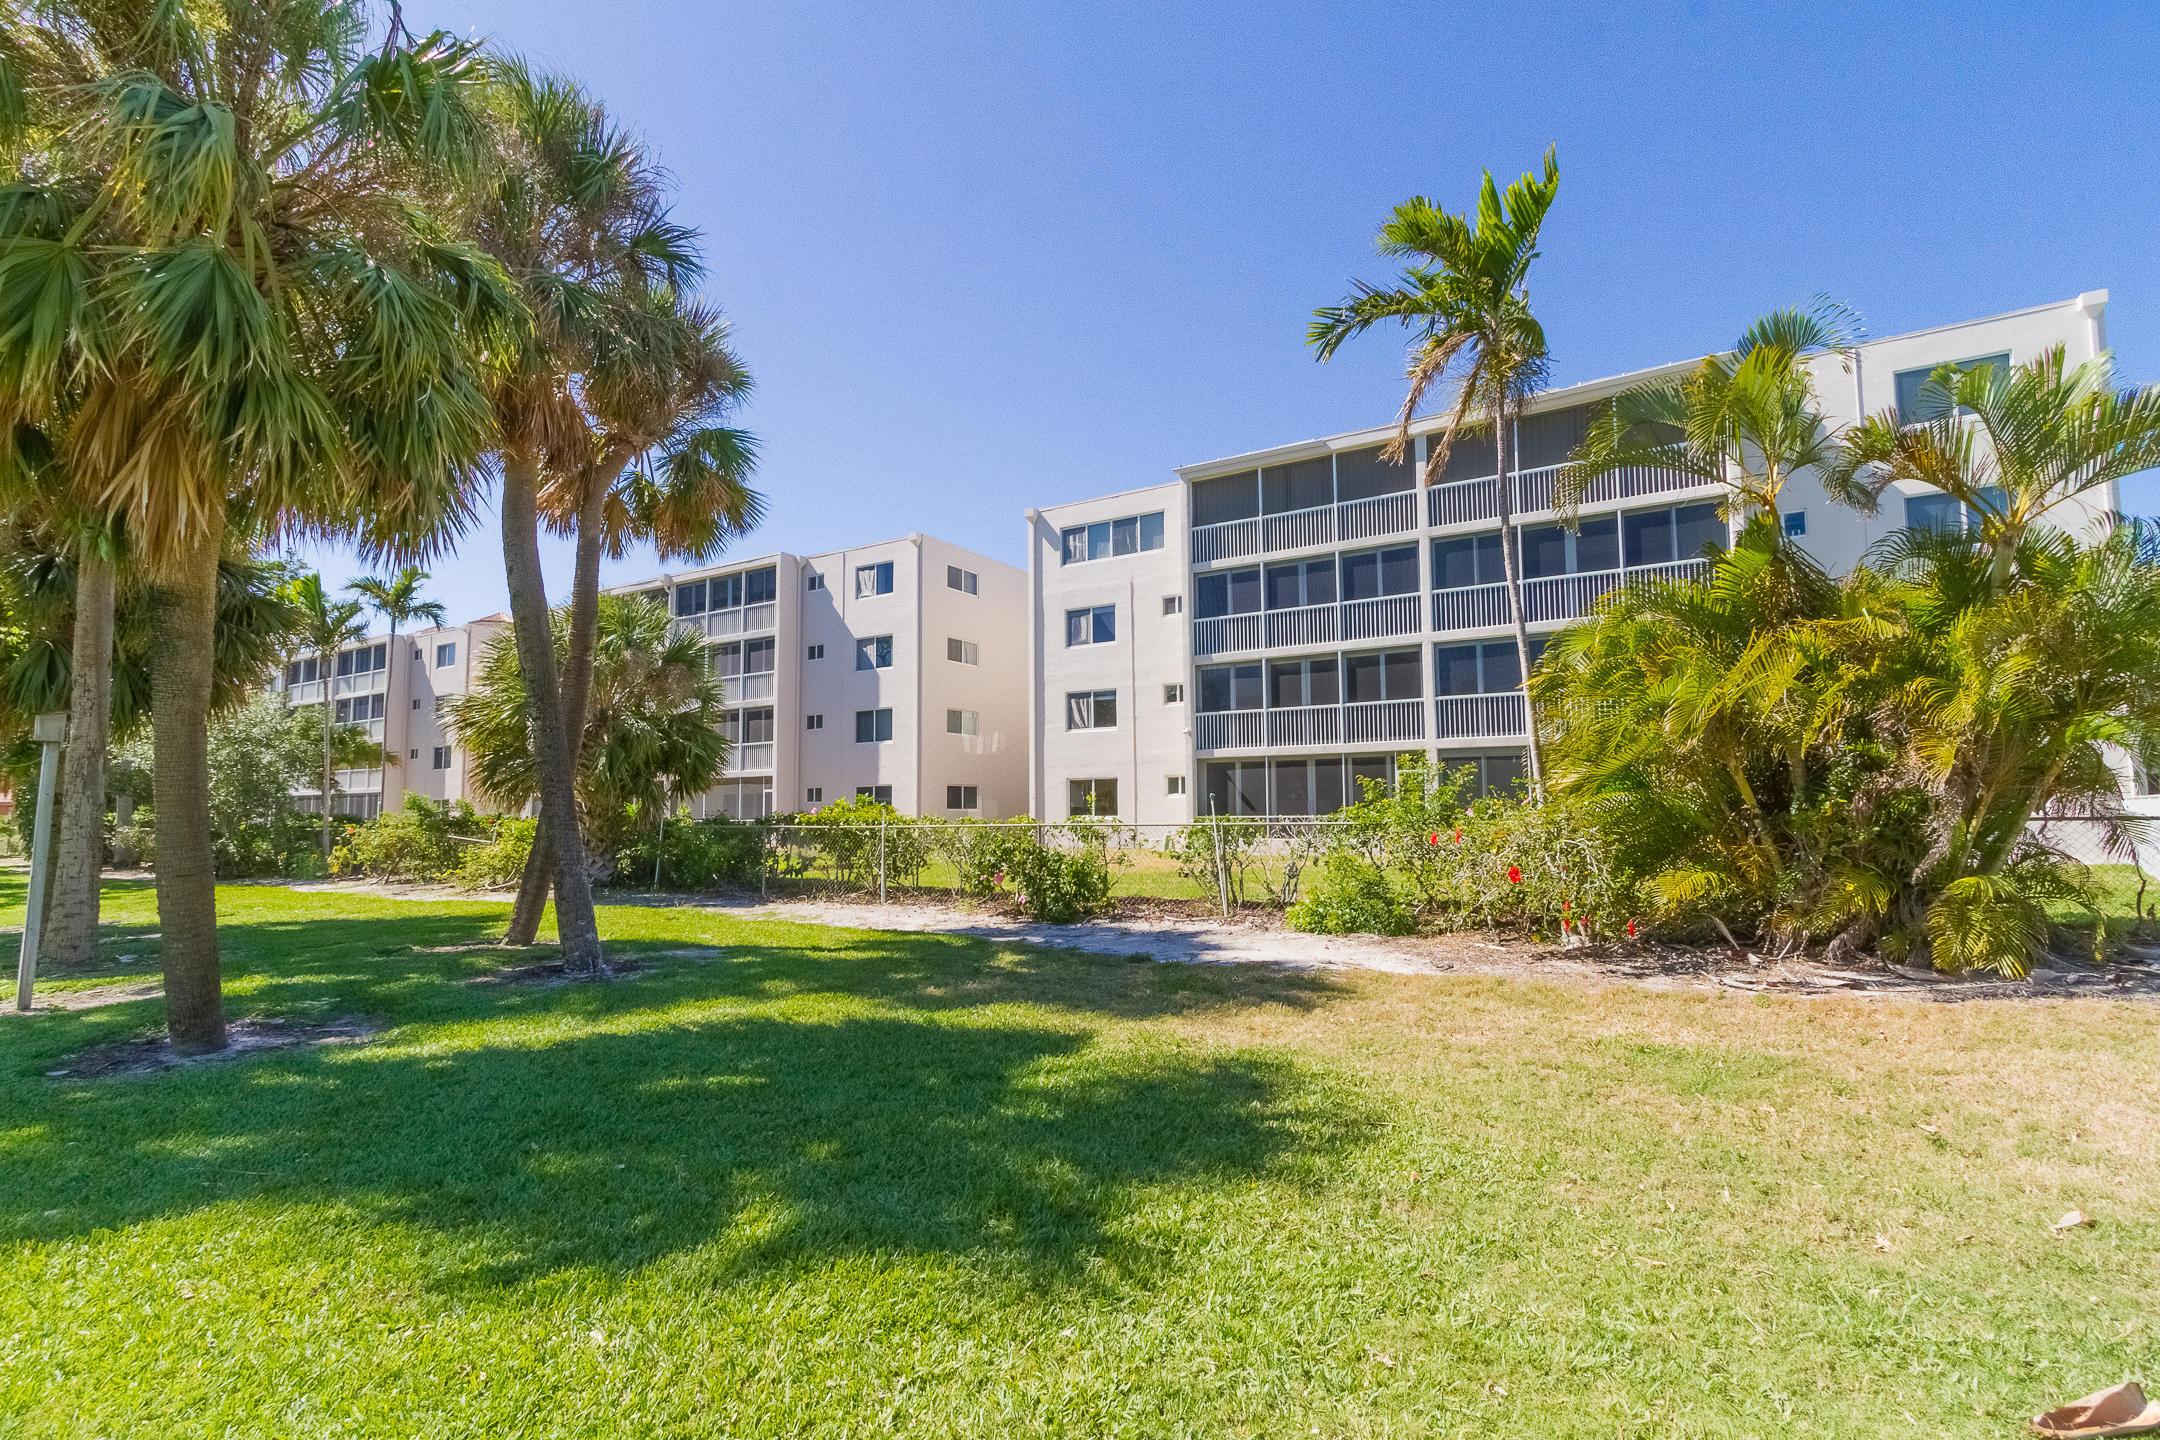 Details for 300 Royal Palm Road E 42b, Boca Raton, FL 33432